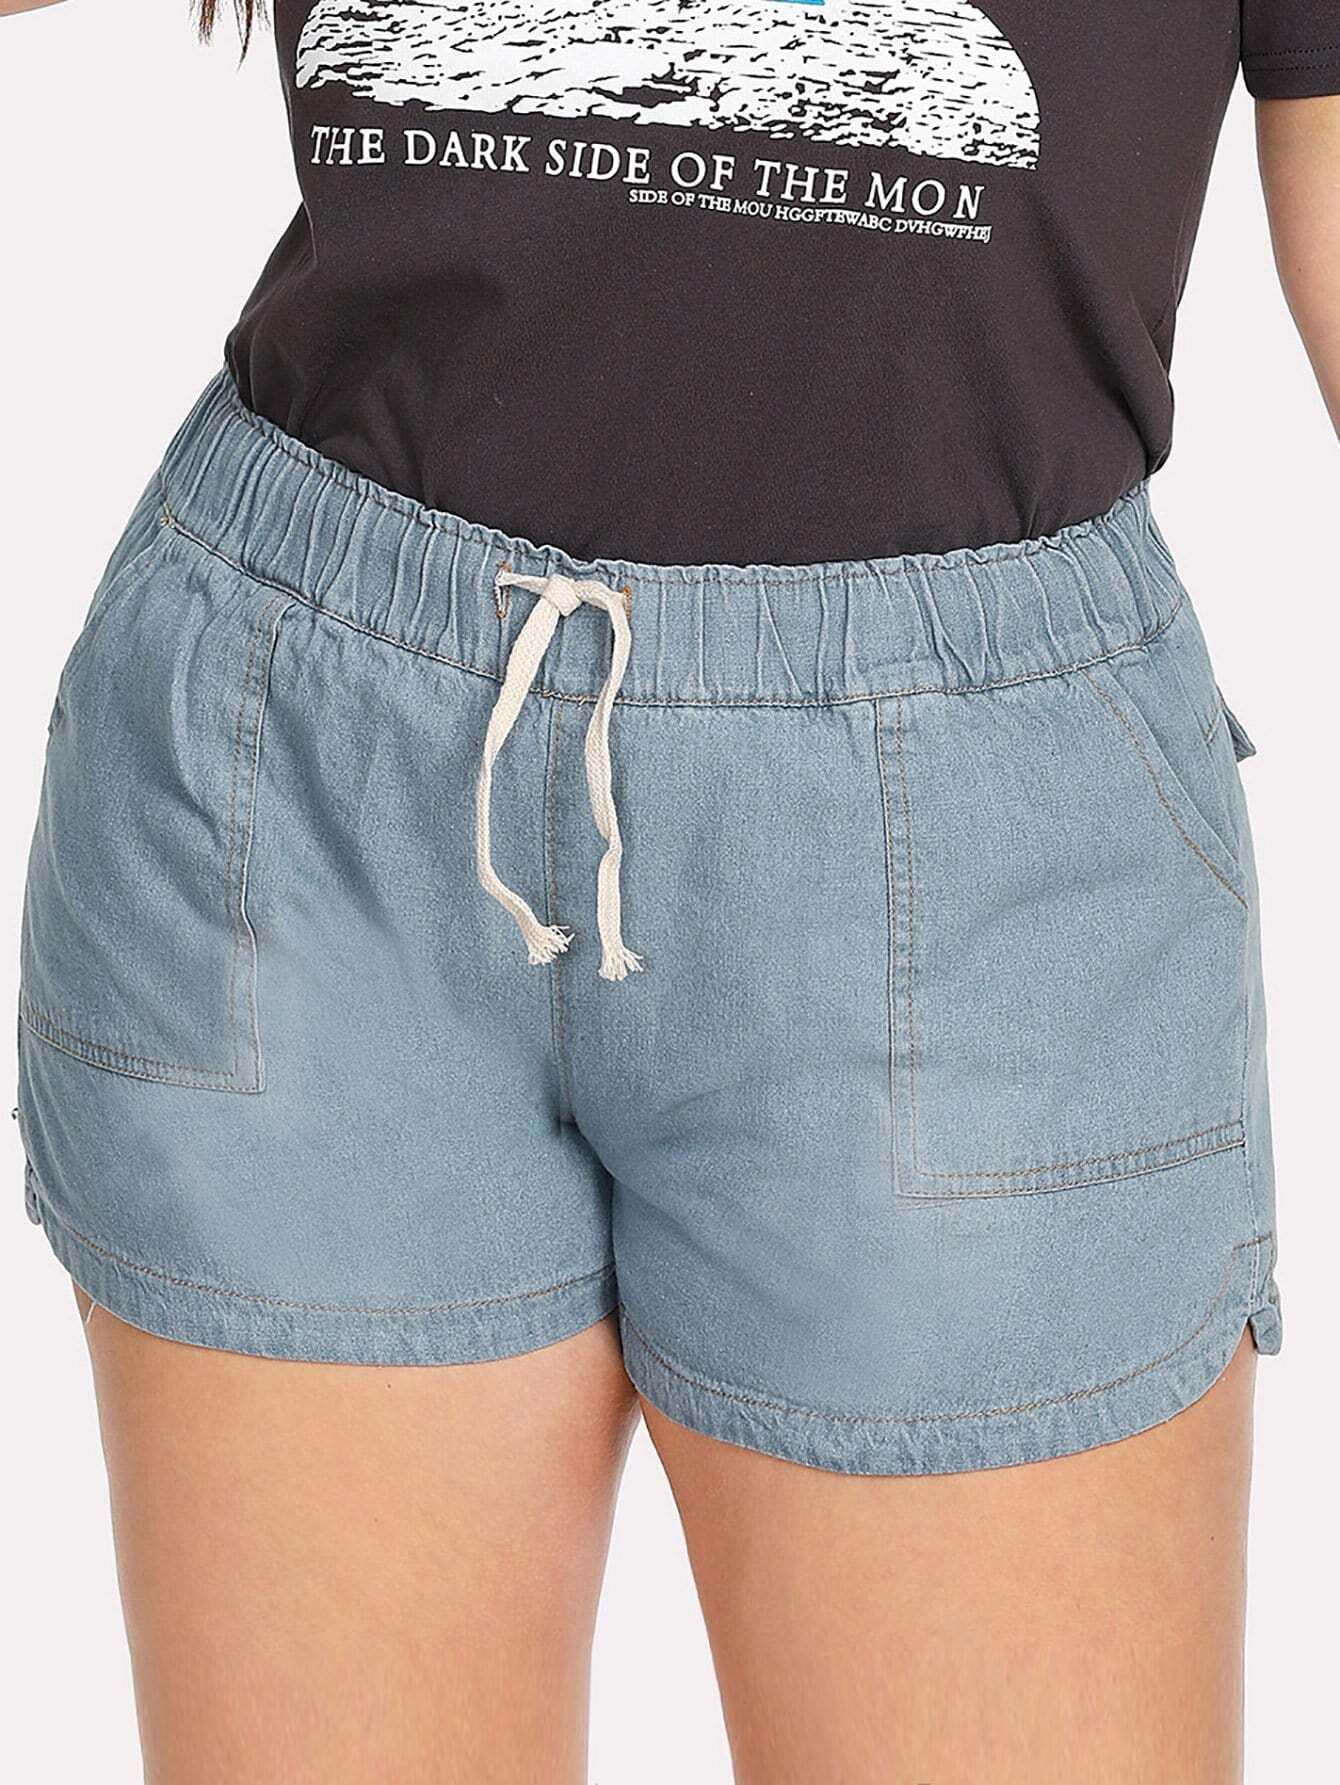 Drawstring Waist Denim Shorts drawstring waist tie dyed shorts